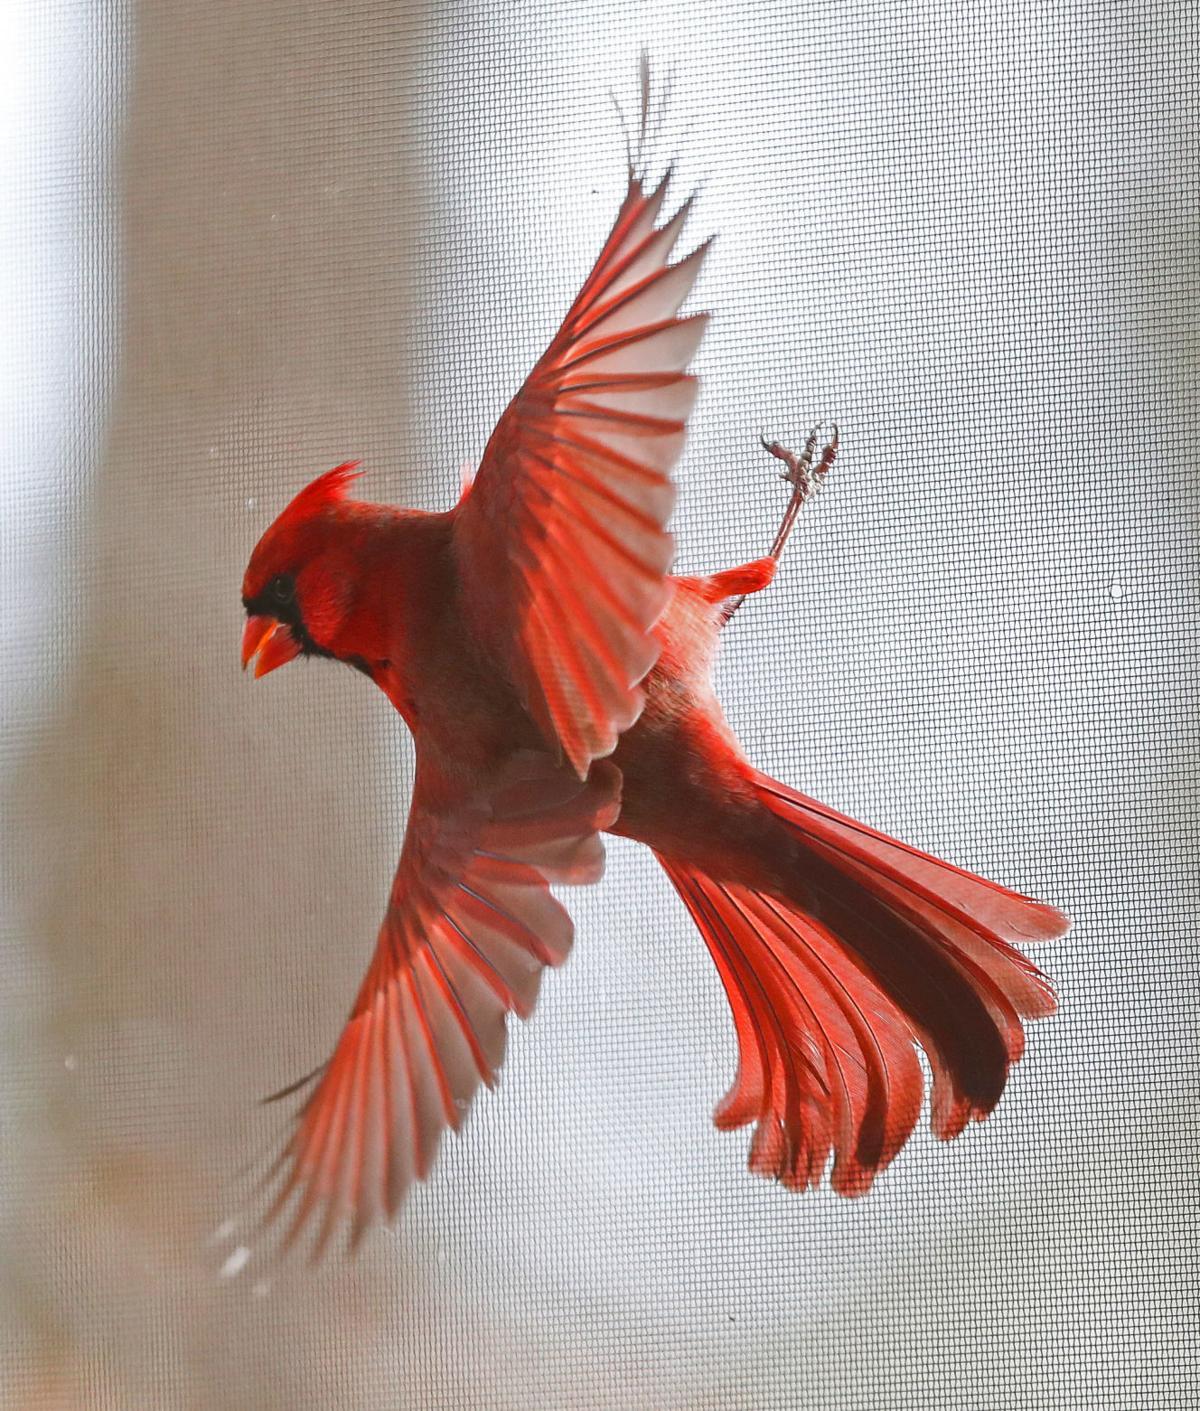 20200111_cdp_news_cardinal479.JPG